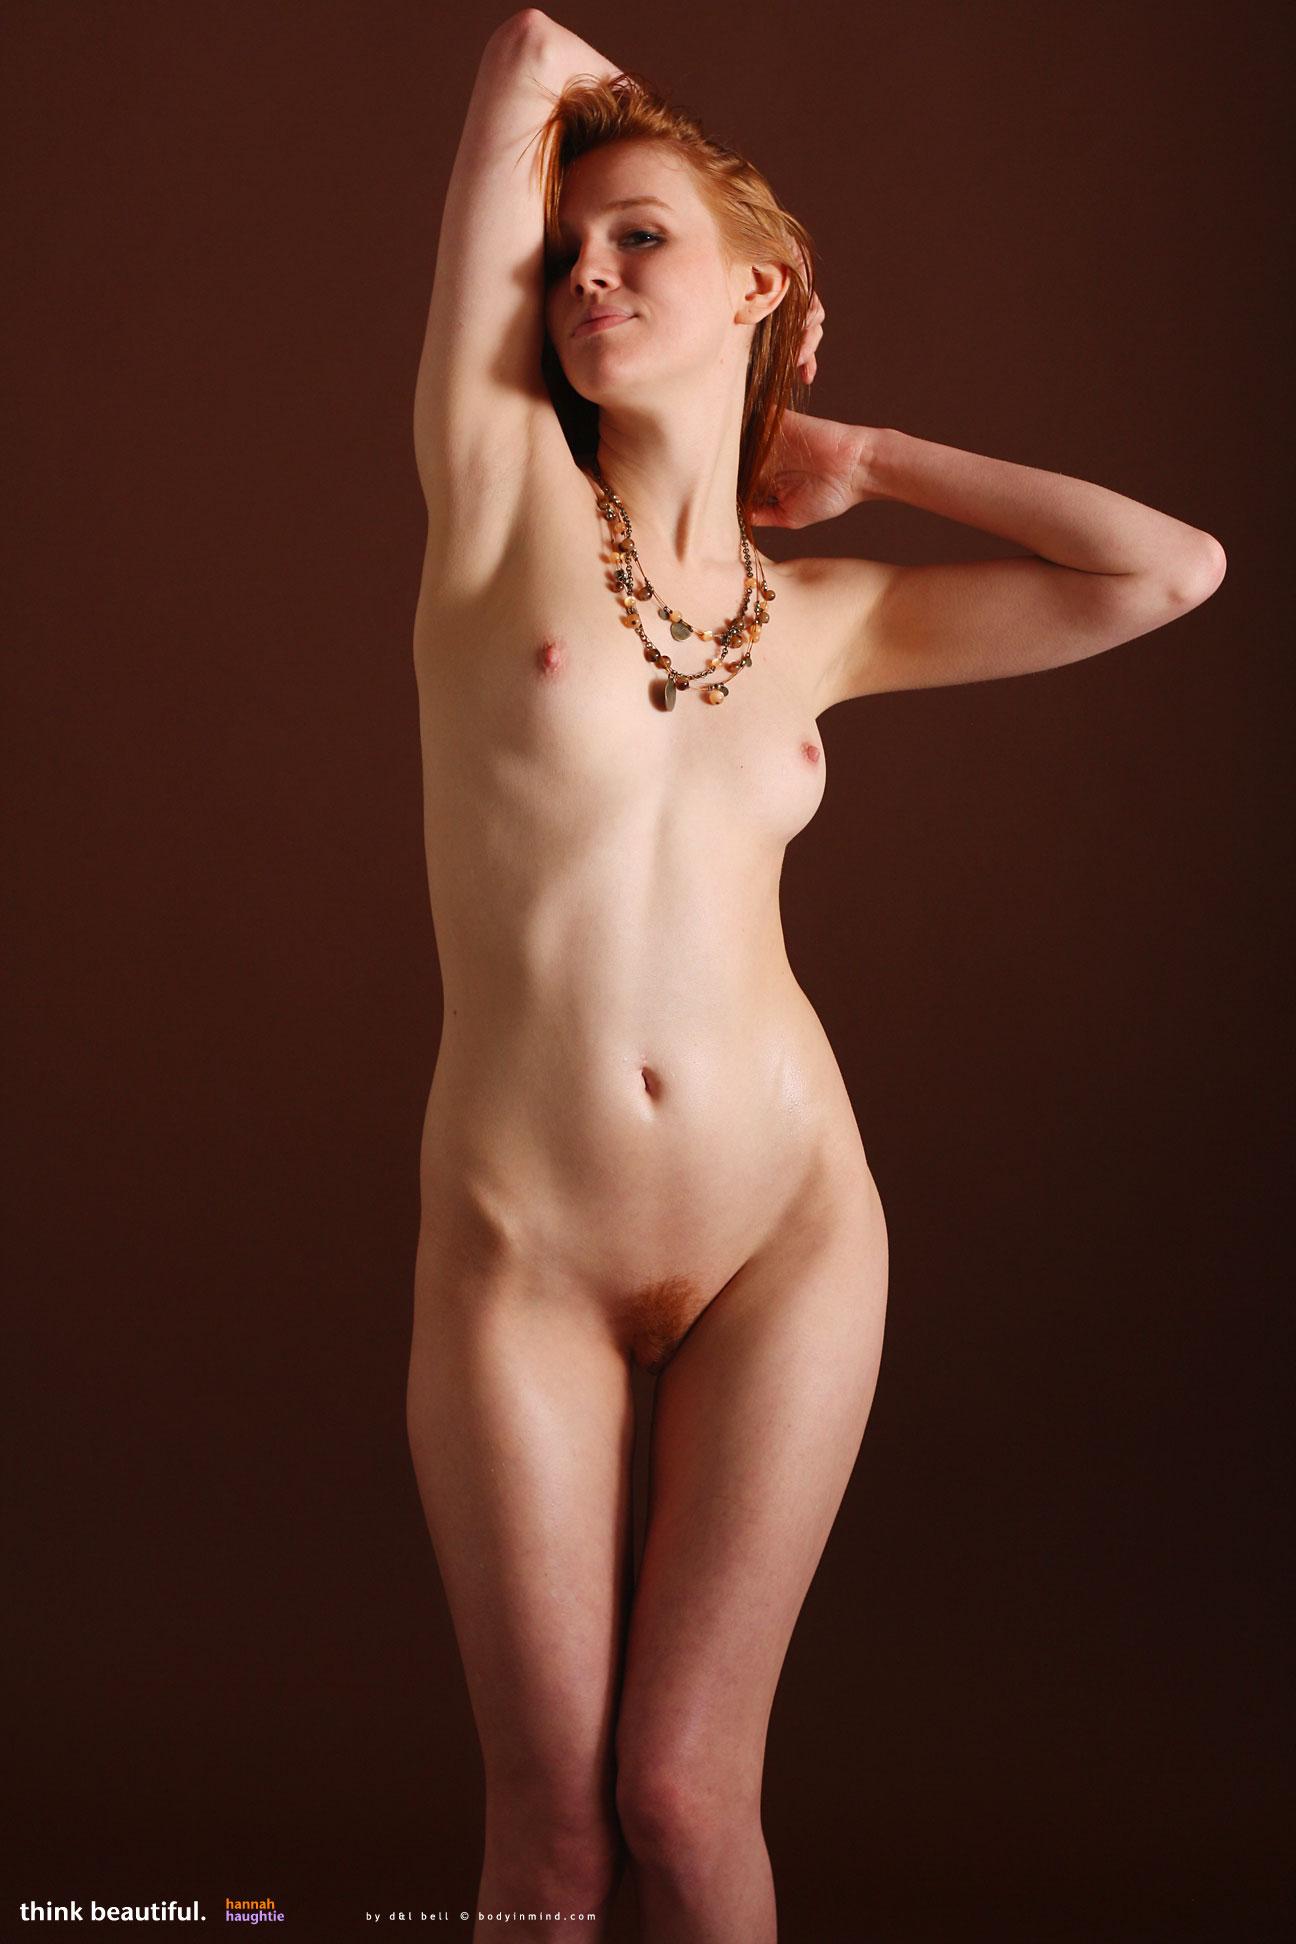 hannah-long-hair-redhead-naked-young-bodyinmind-05